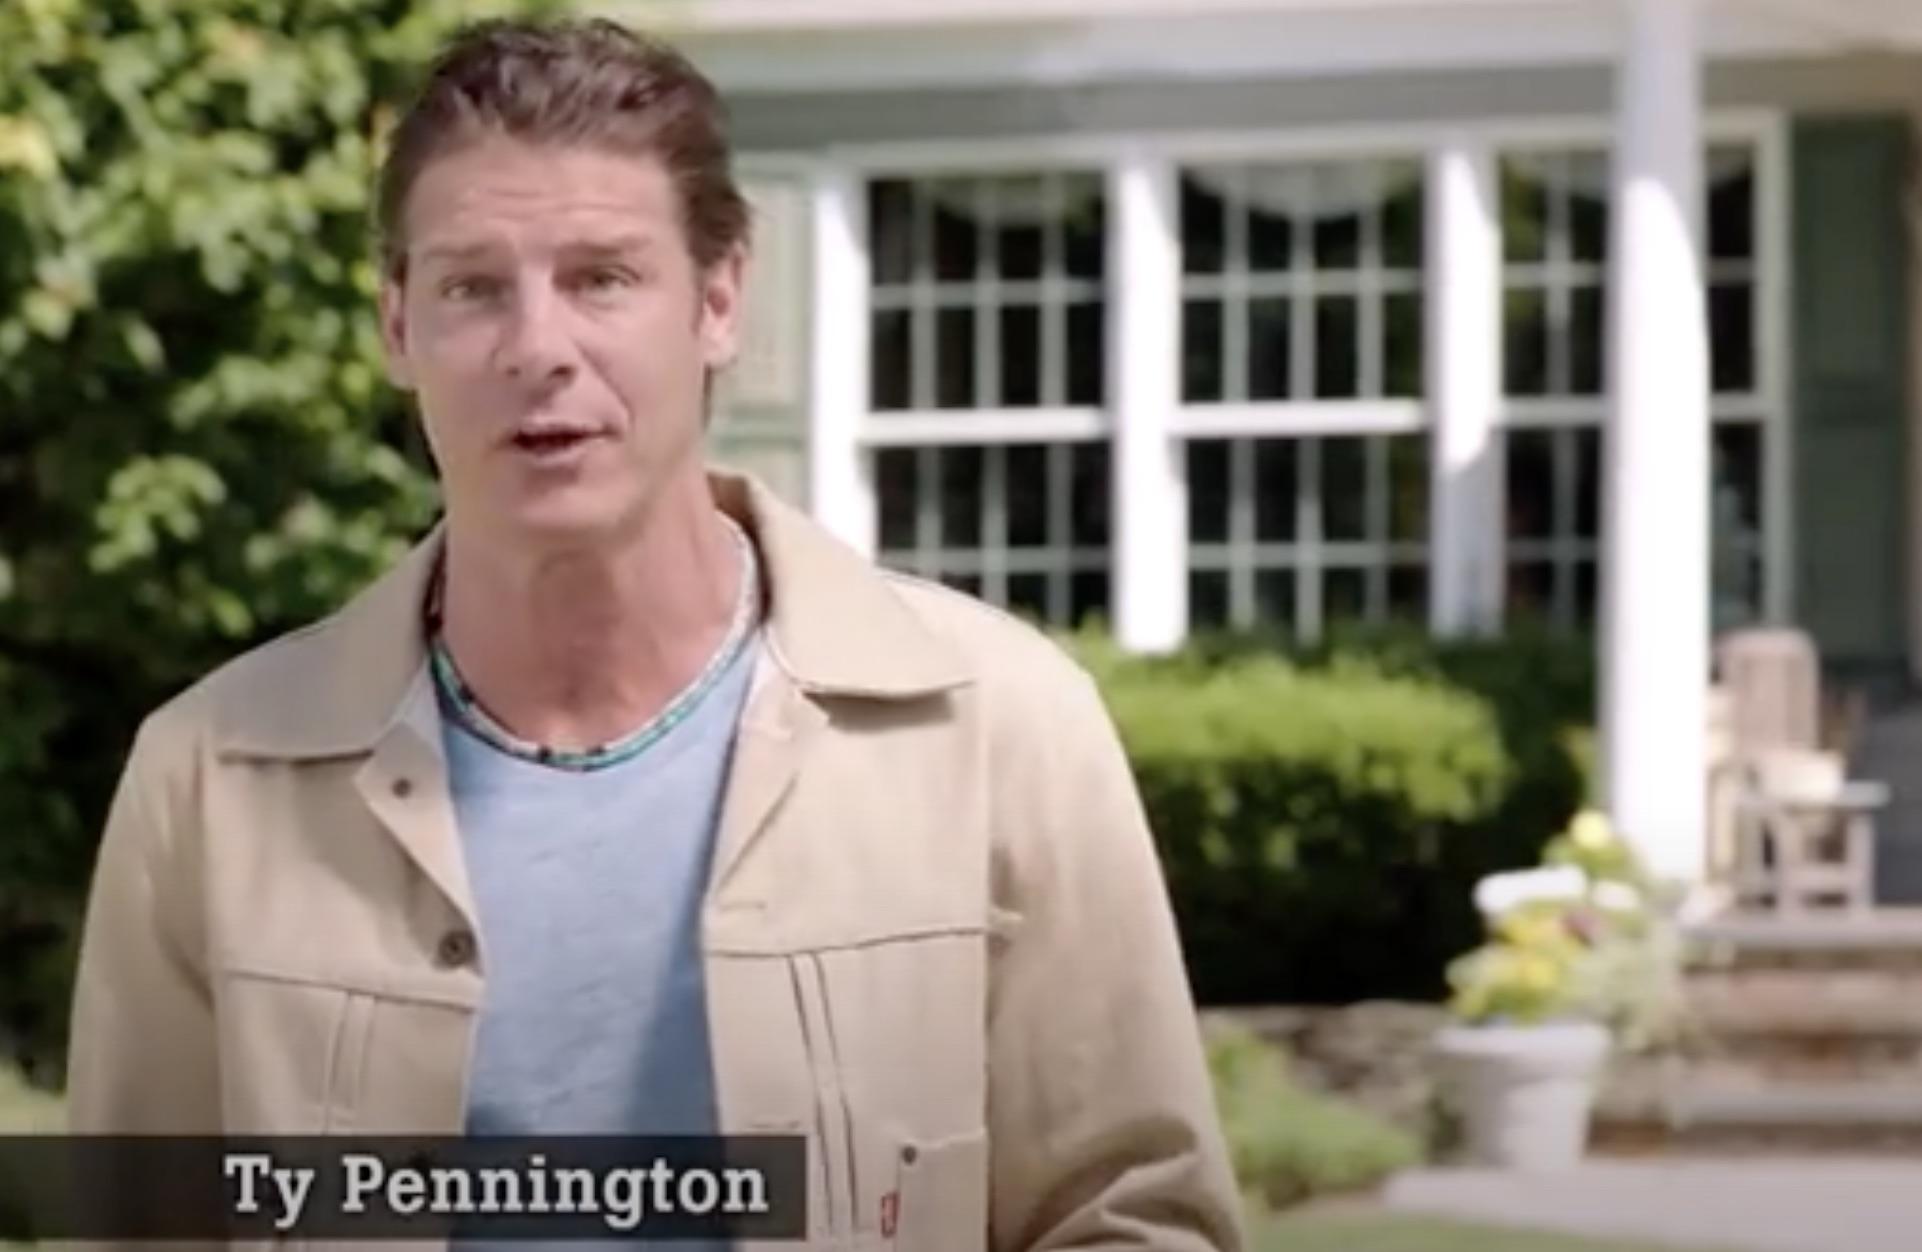 Ty_Pennington_tv_commercial_script_writing_Tryna_Fitzpatrick_copywriter